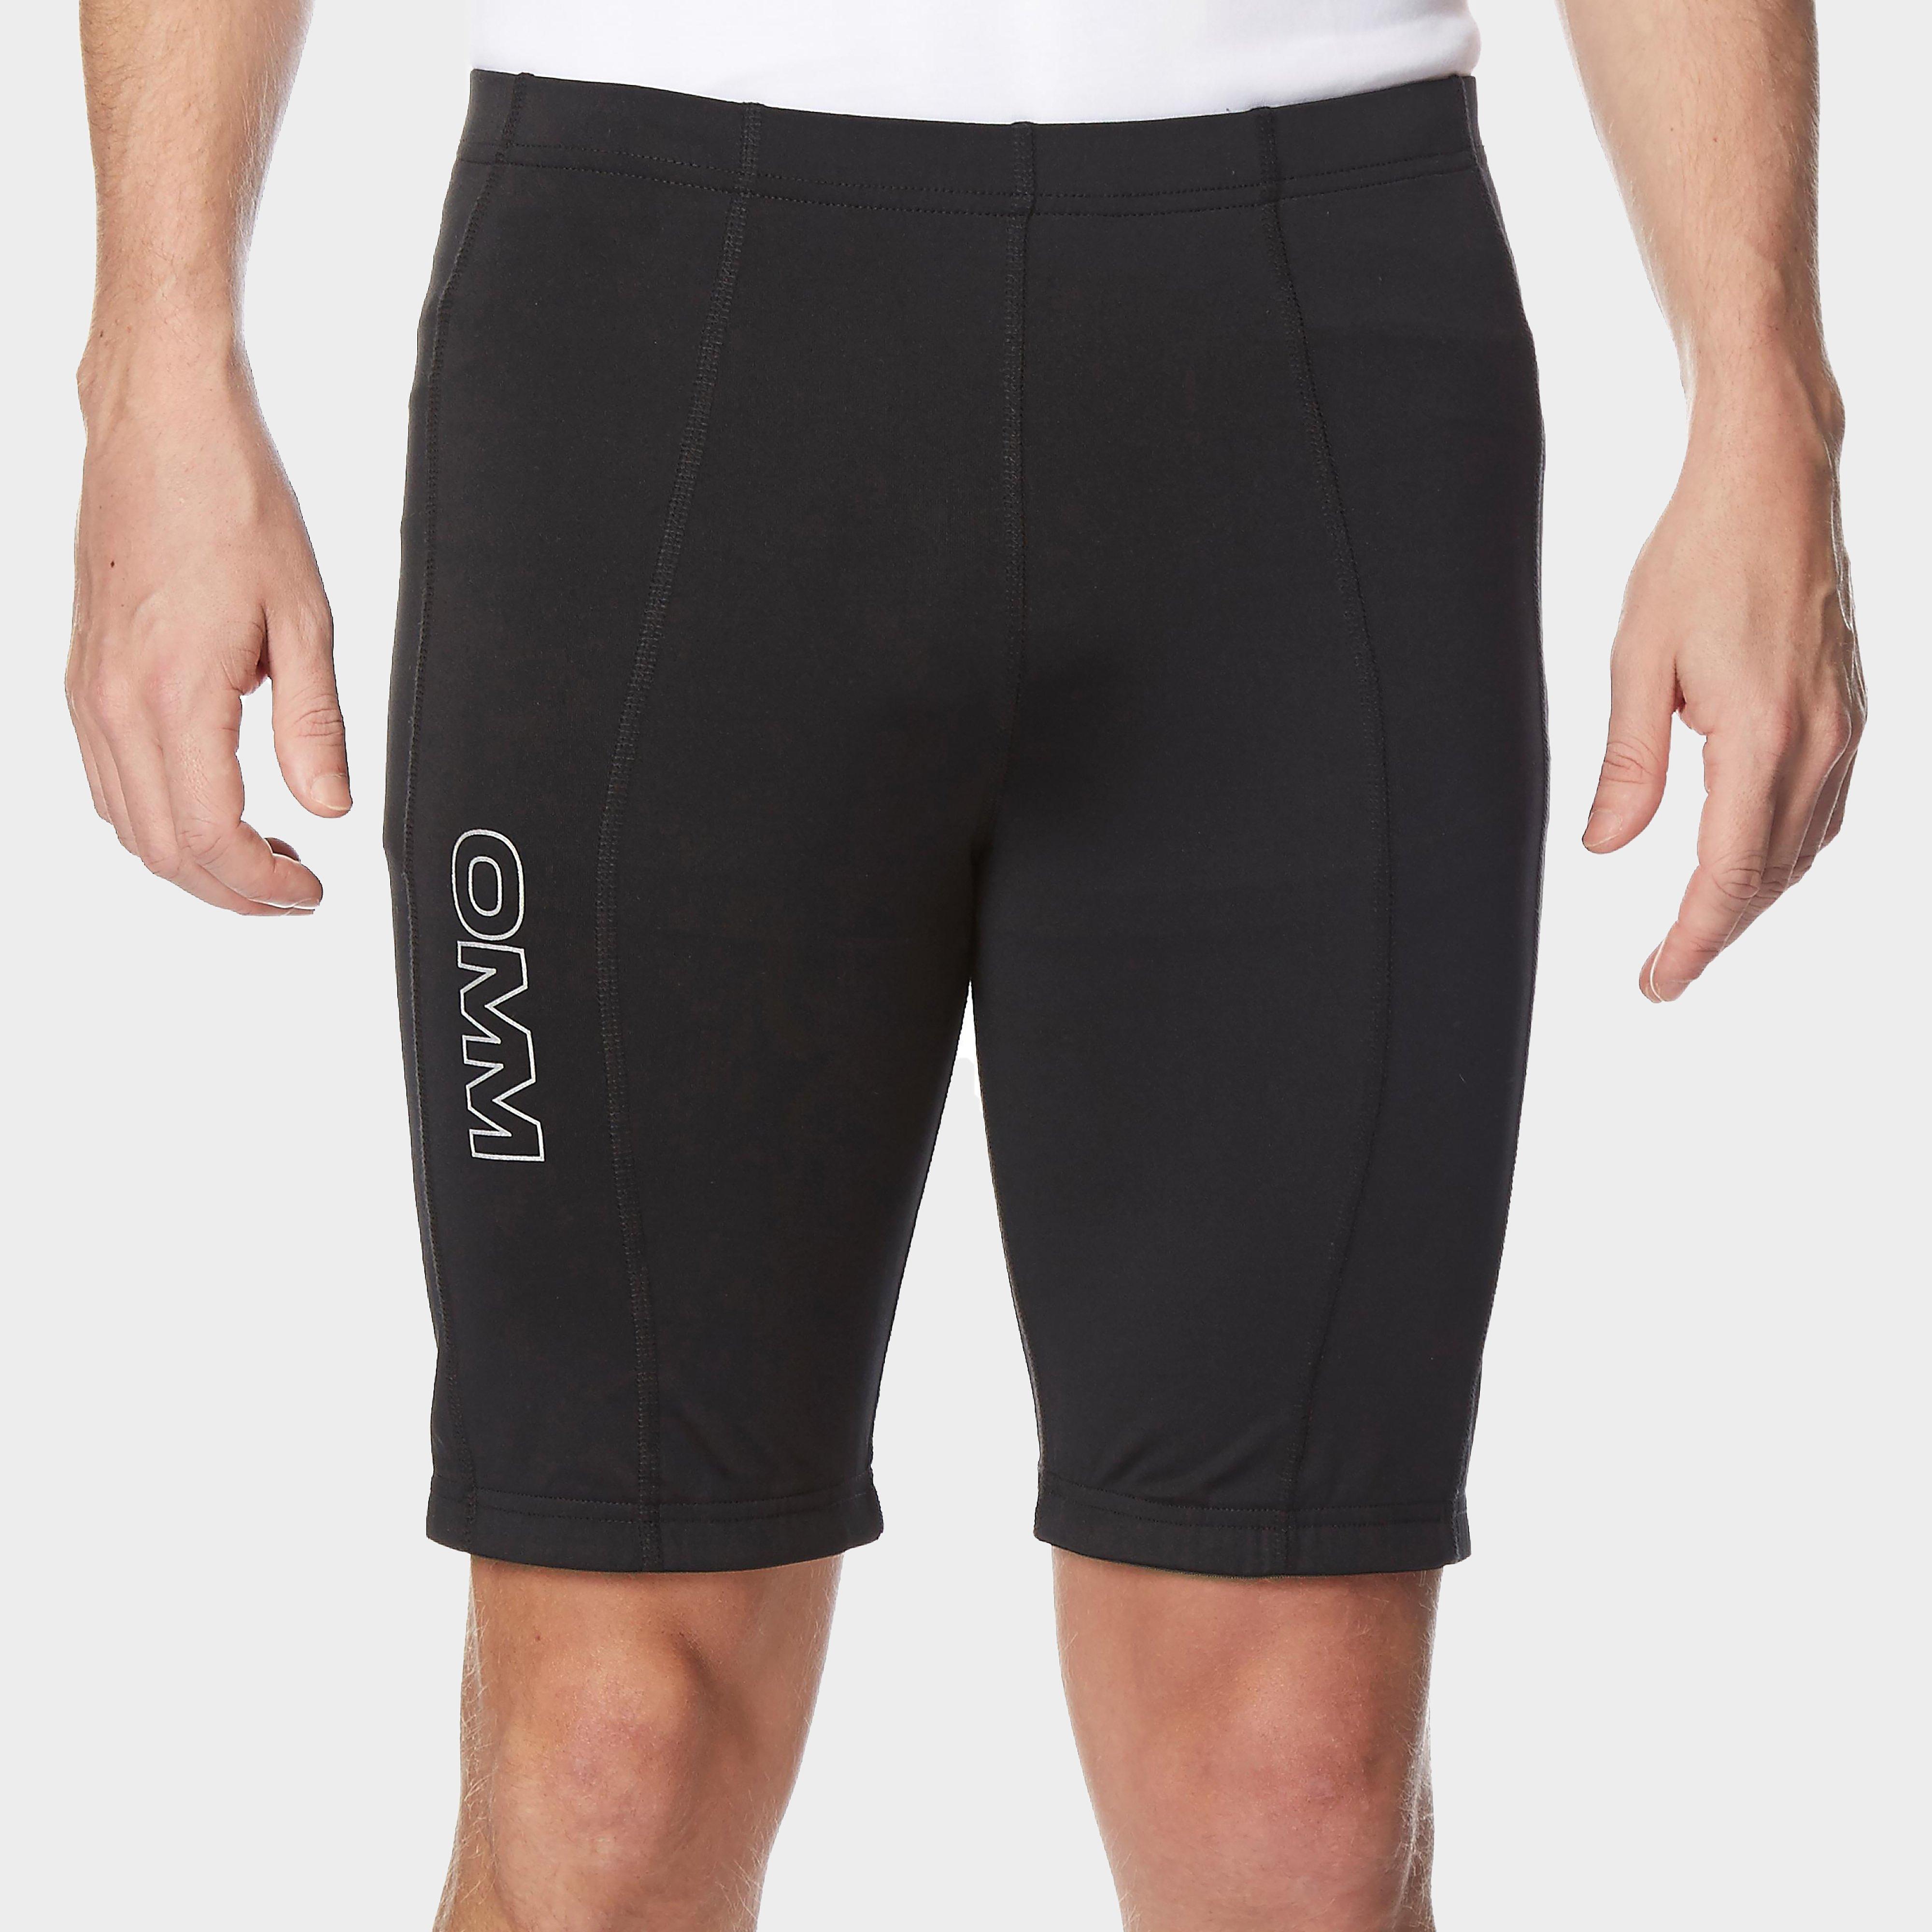 Ordnance Survey Velo Cycling Gps - Black  Black